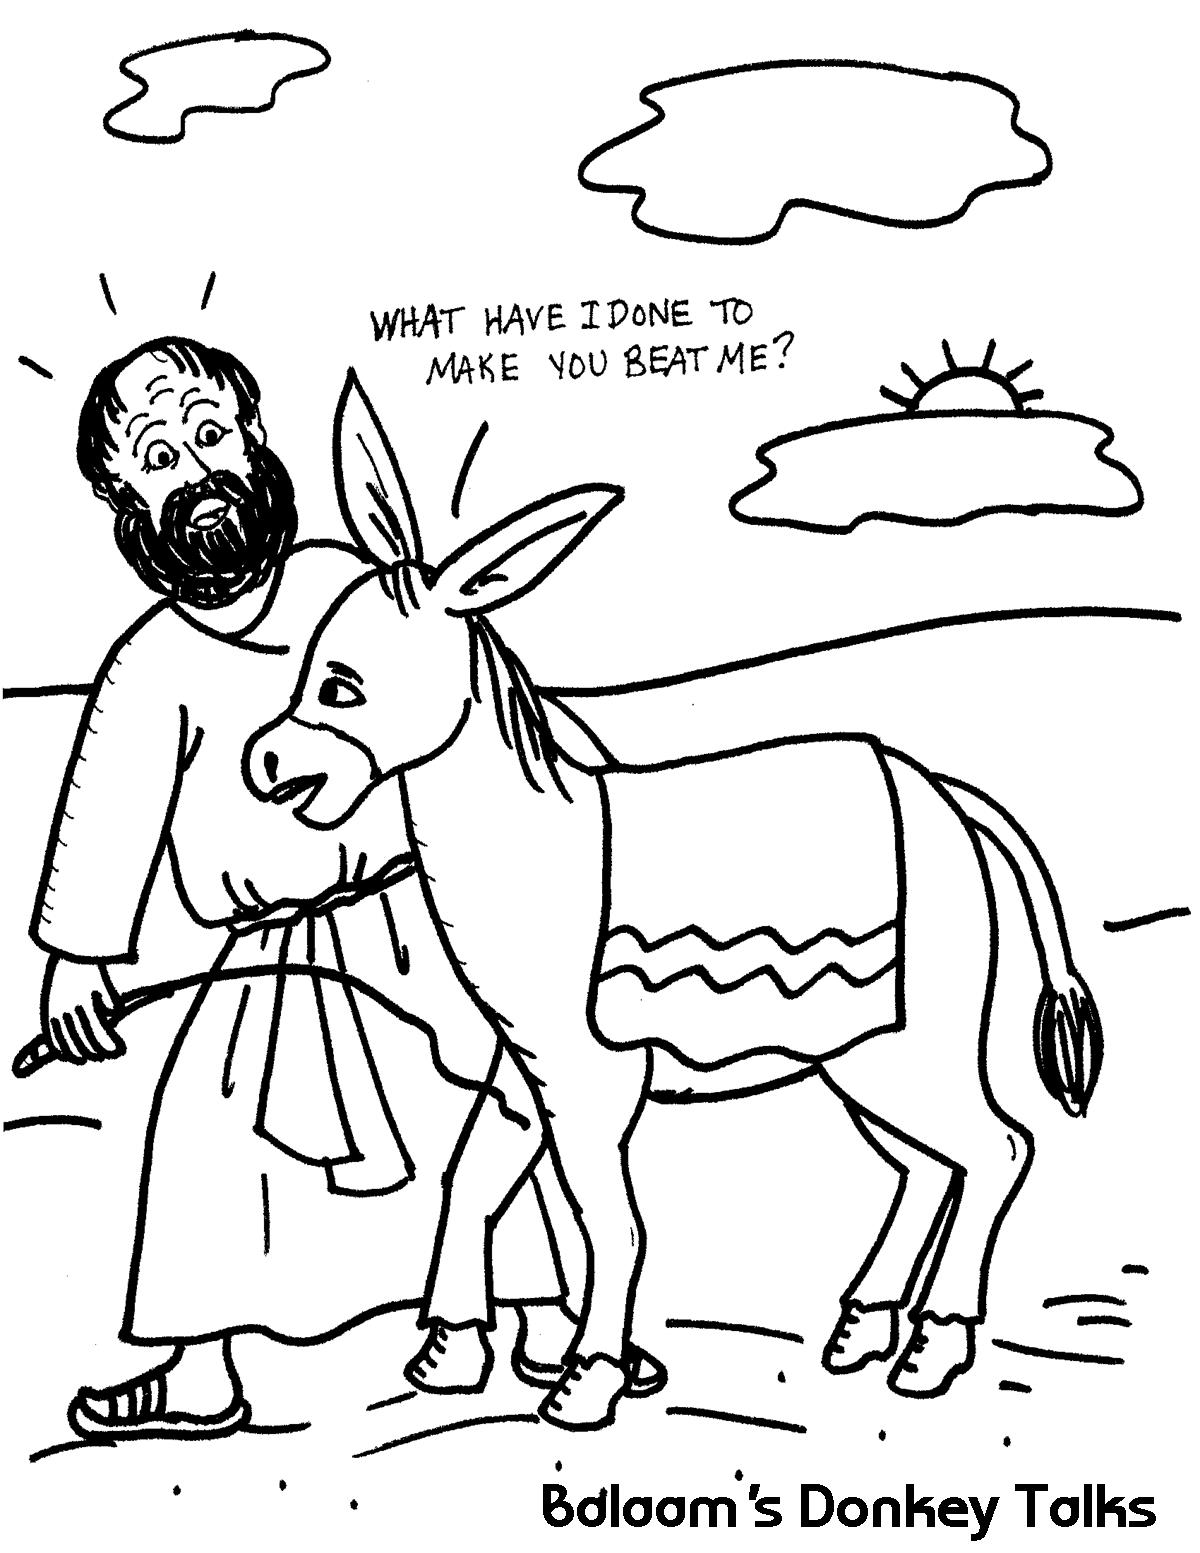 Balaam's Donkey Talks